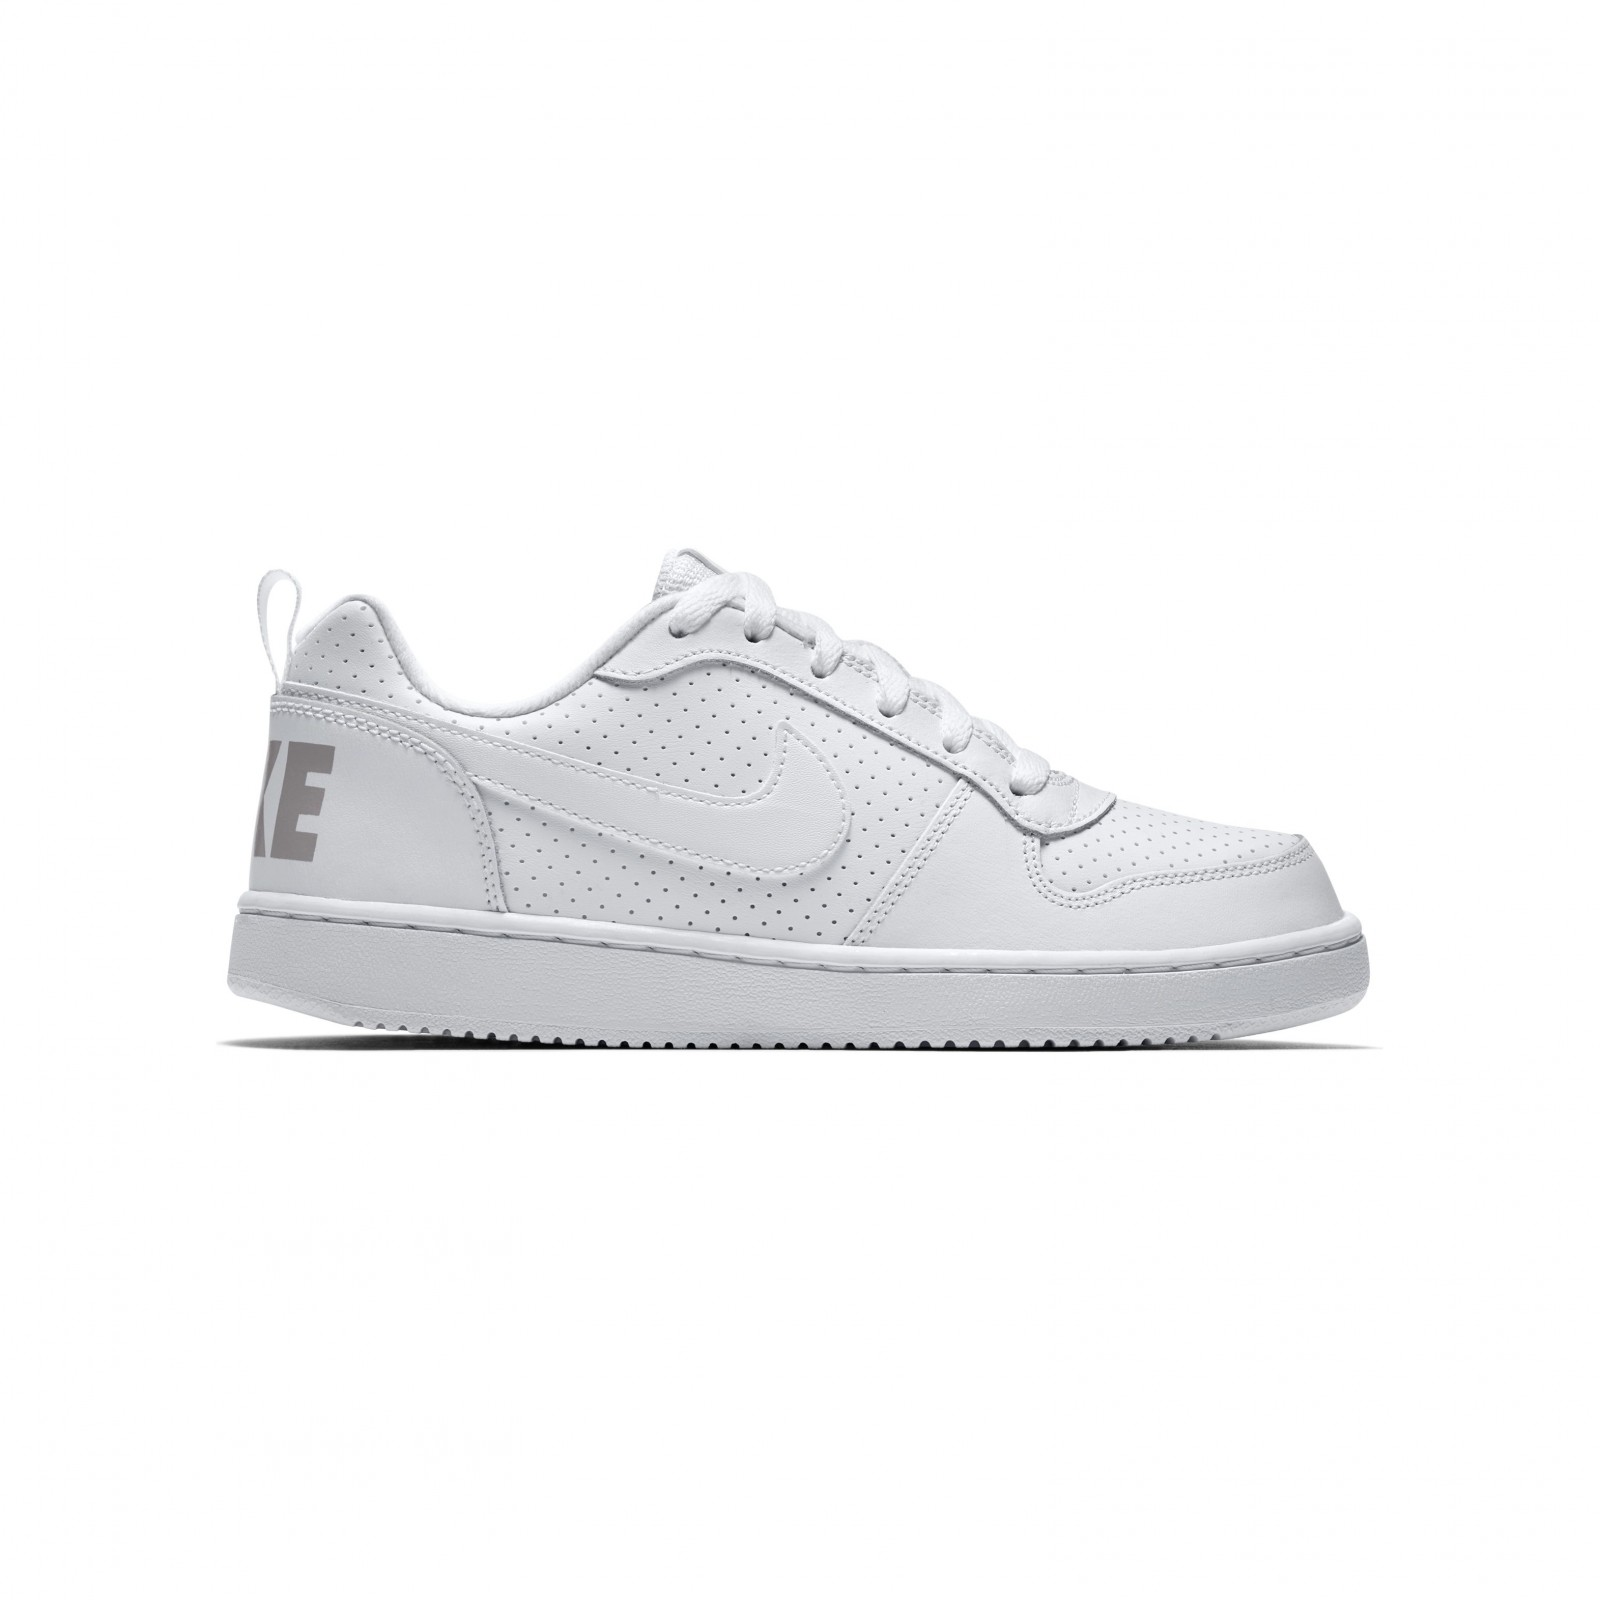 Dětské boty Nike COURT BOROUGH LOW (GS)  3e6df8ac35